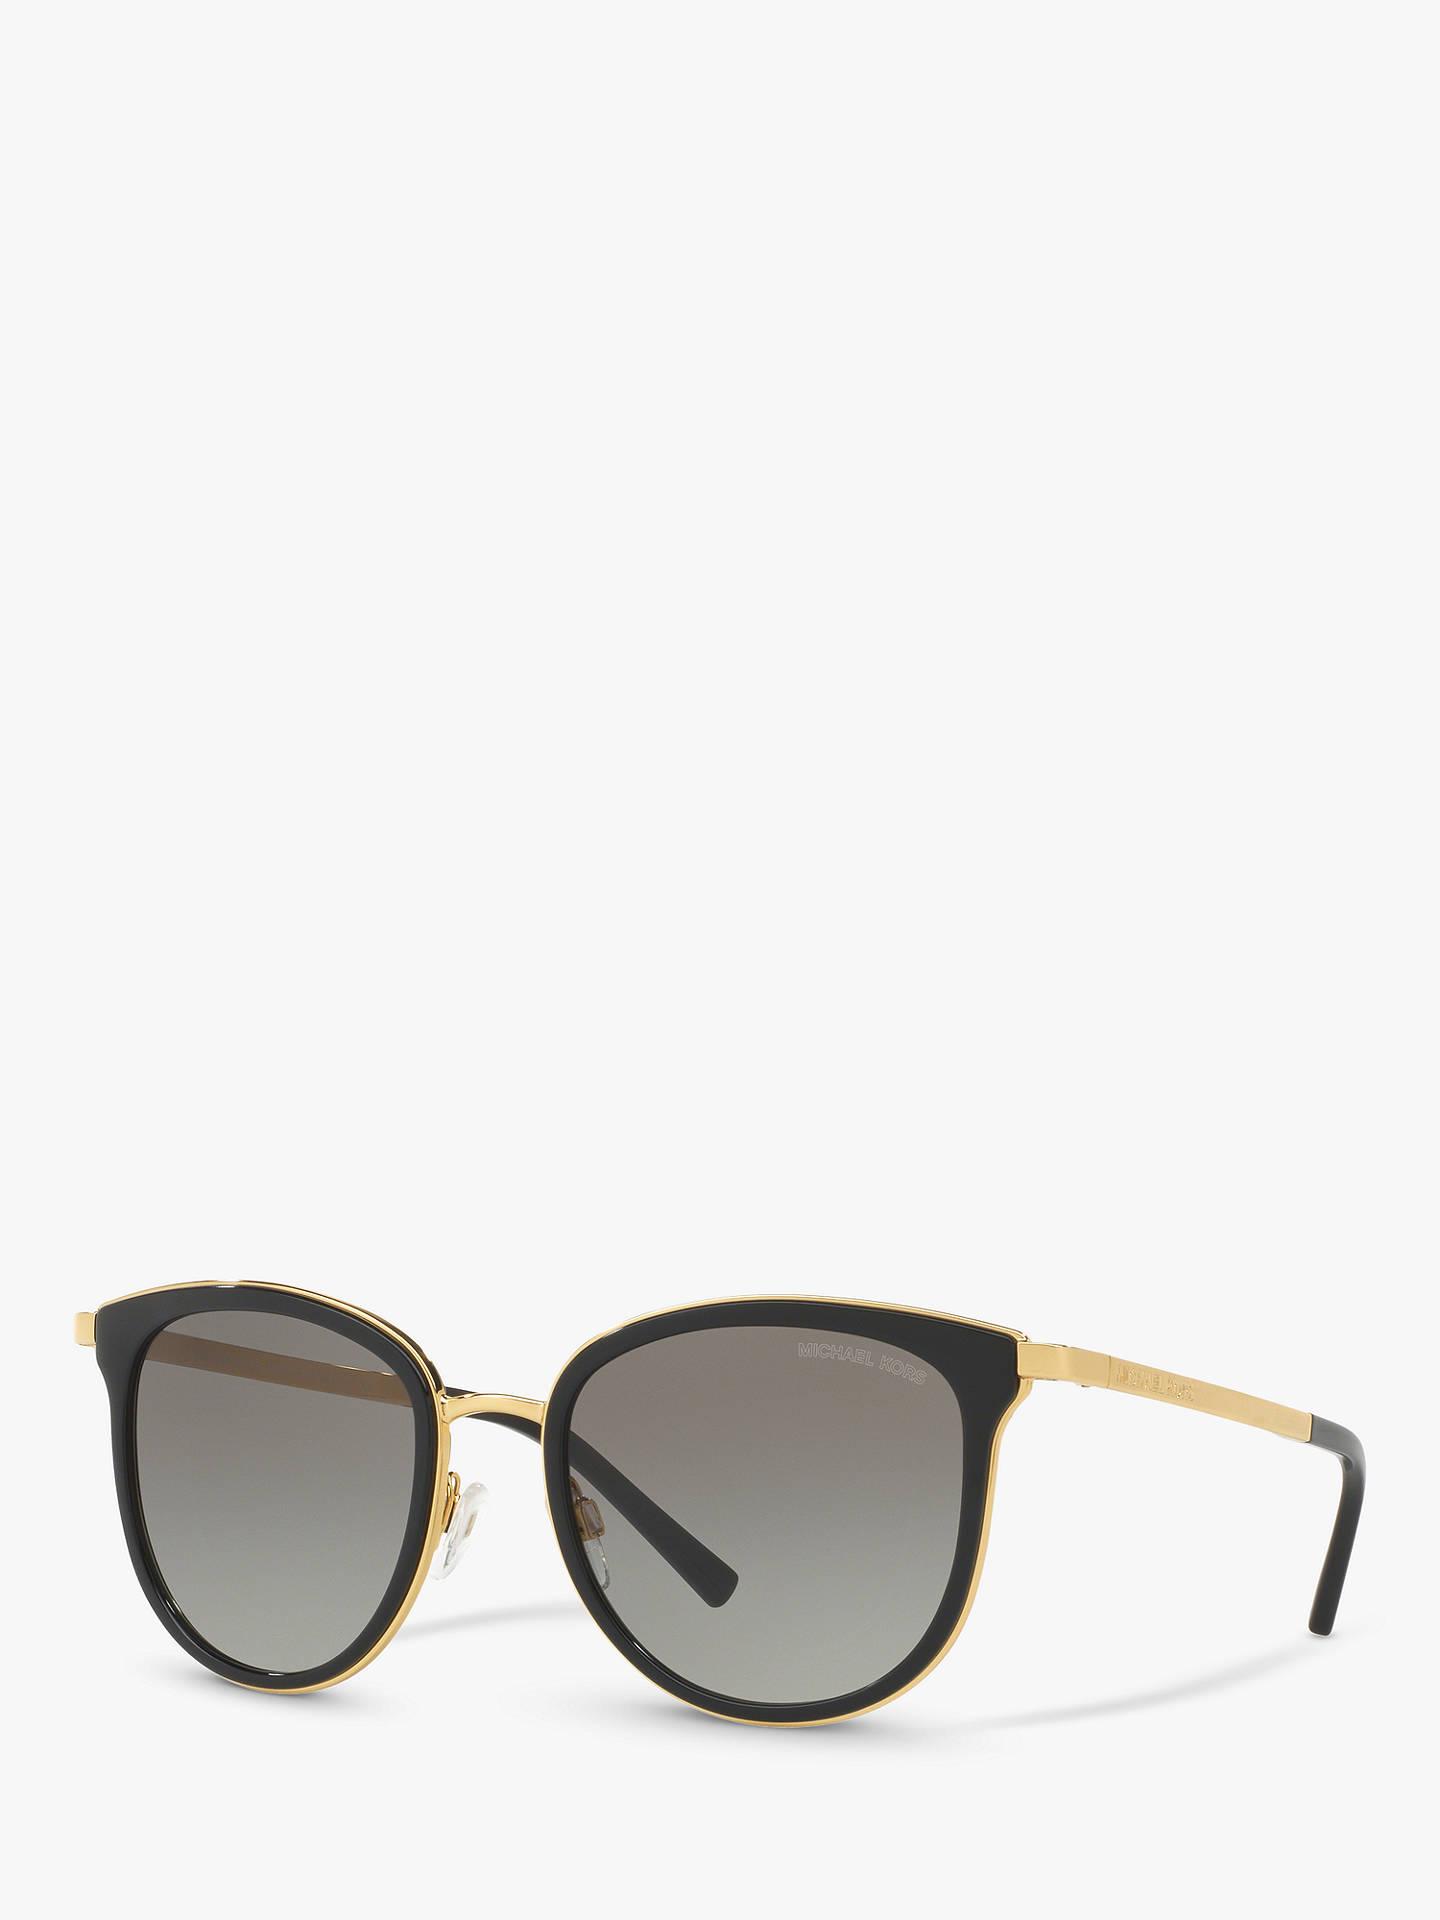 fc3404d841a Michael Kors MK1010 Adrianna Oval Sunglasses at John Lewis   Partners